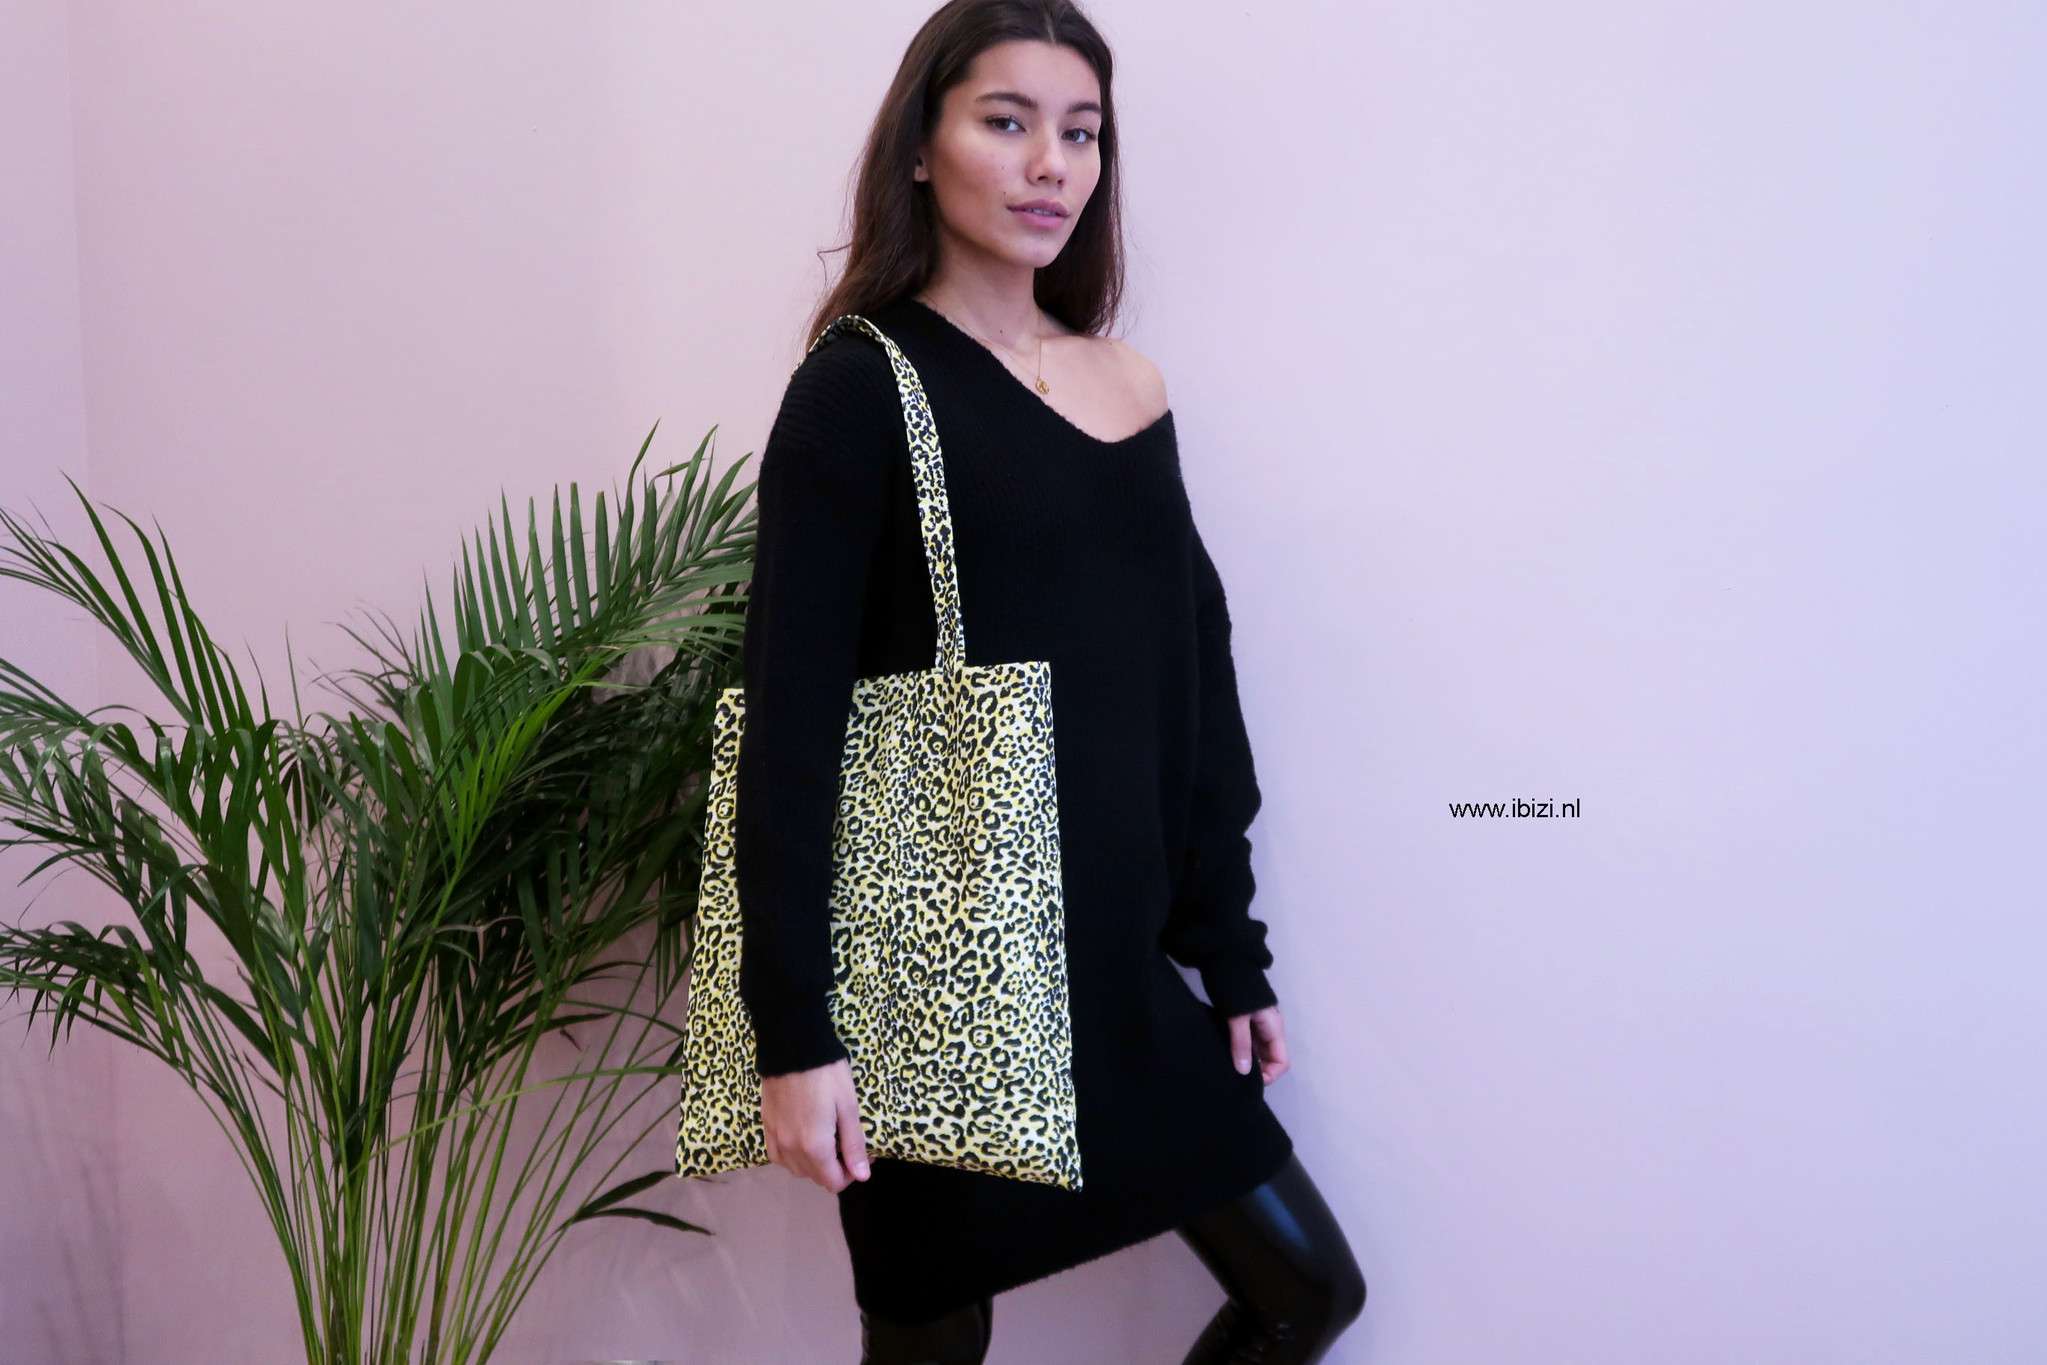 Leopard Print Tas - Tote